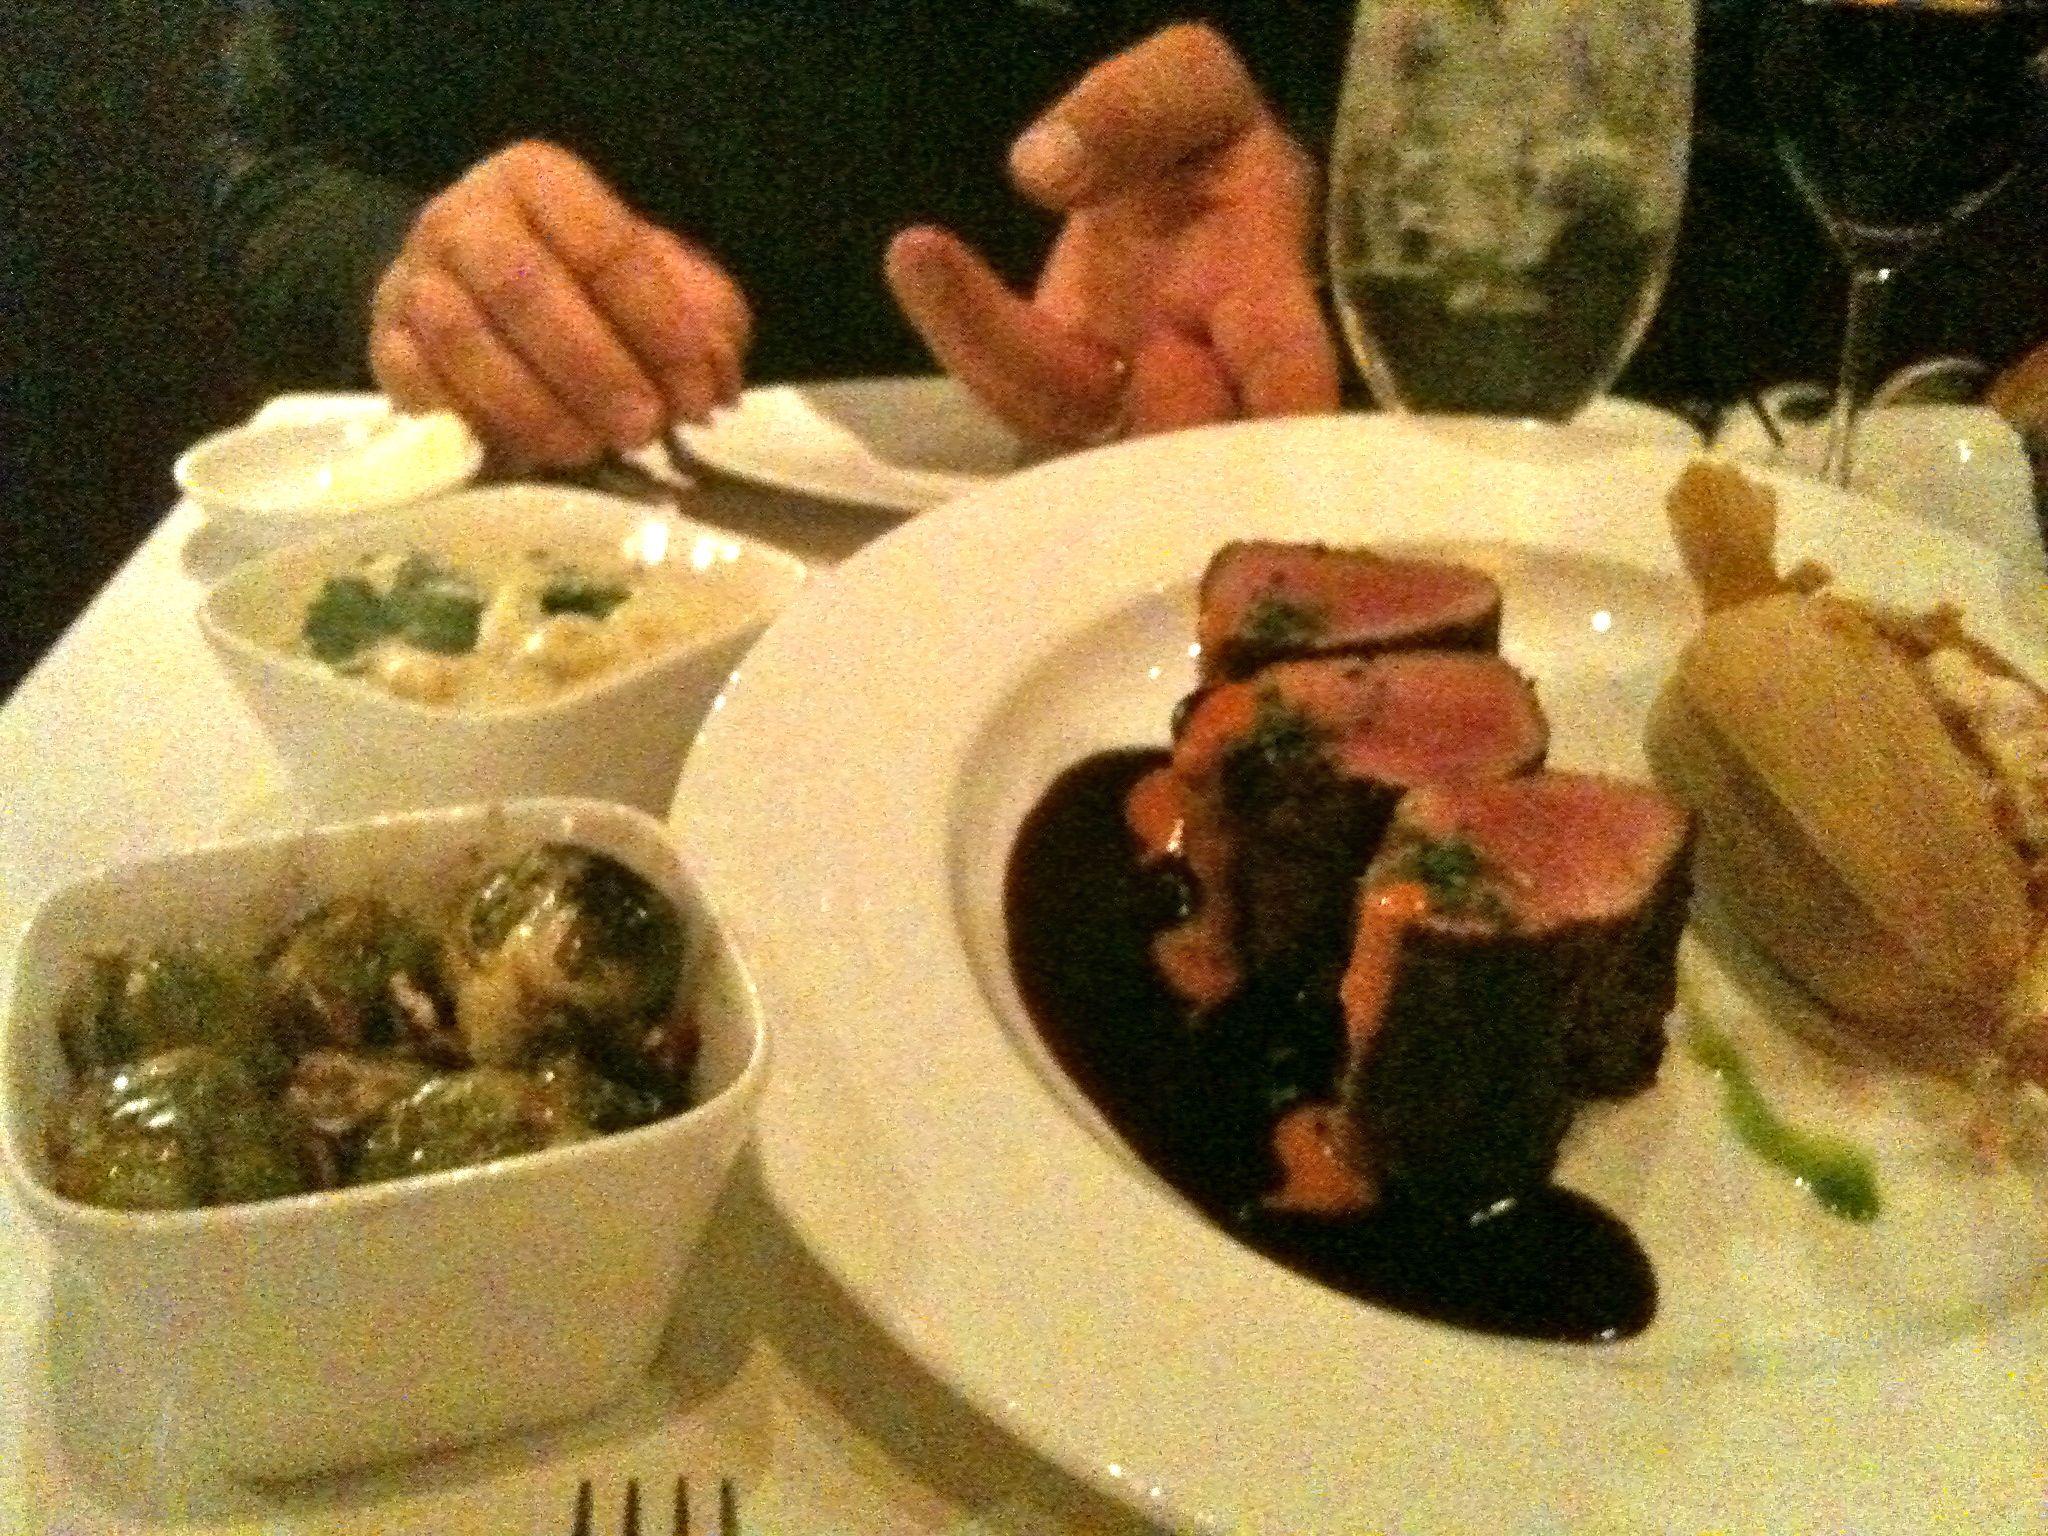 Bobby Flay's Mesa Grill in Las Vegasmmmmm! The Pork